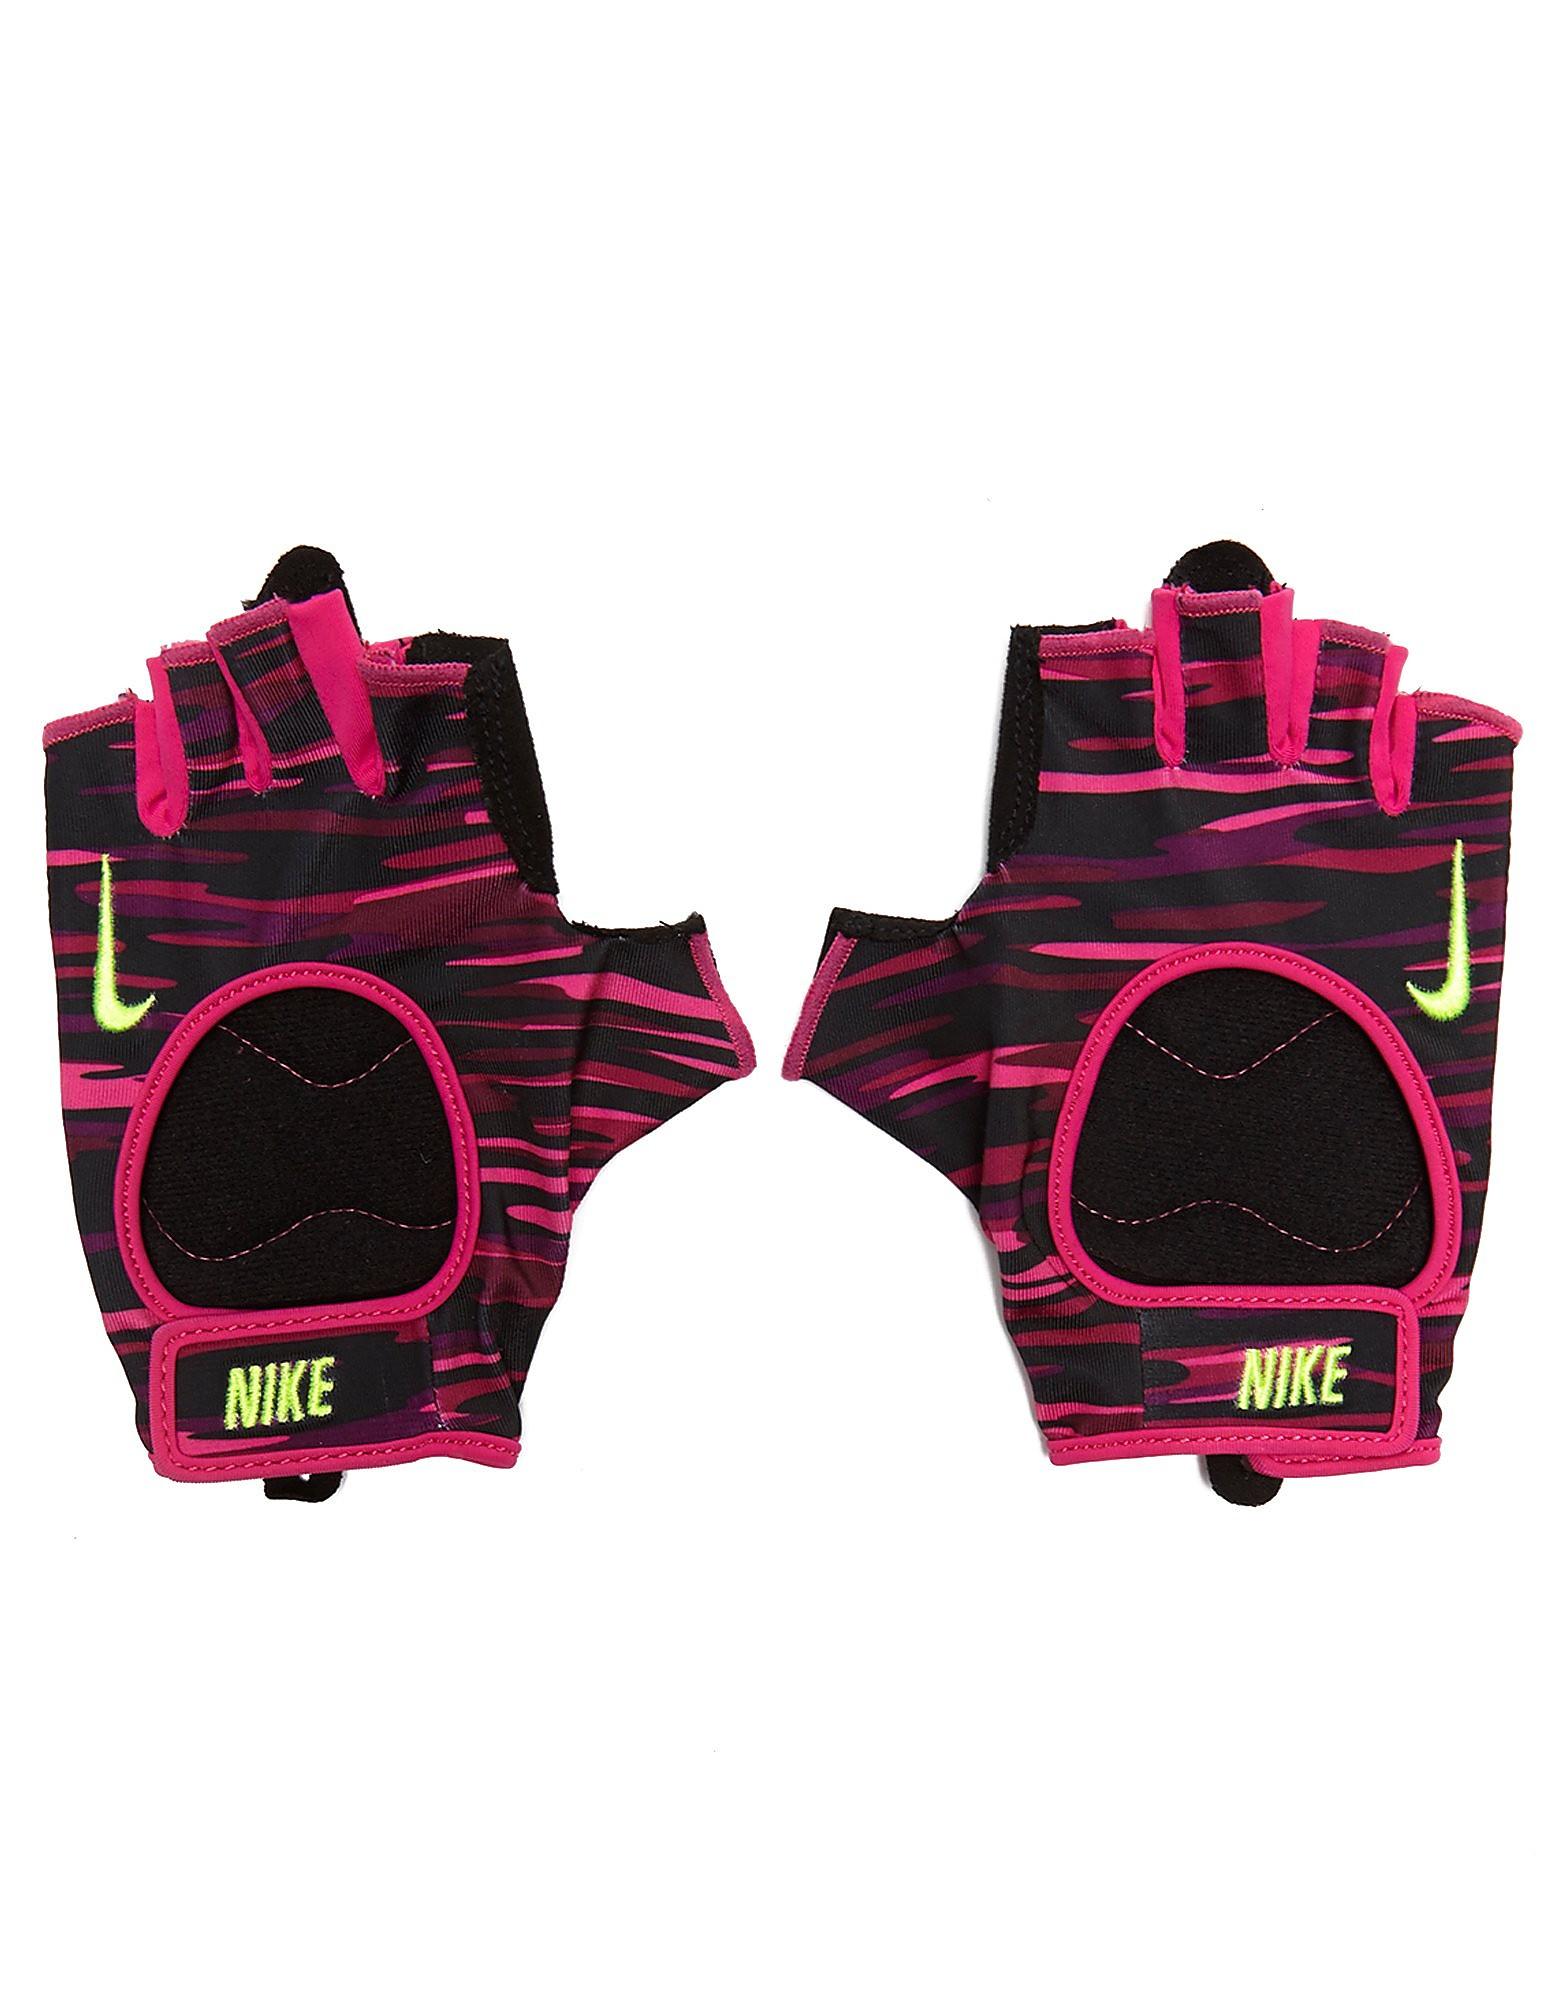 Nike Fit Trainings-Handschuhe